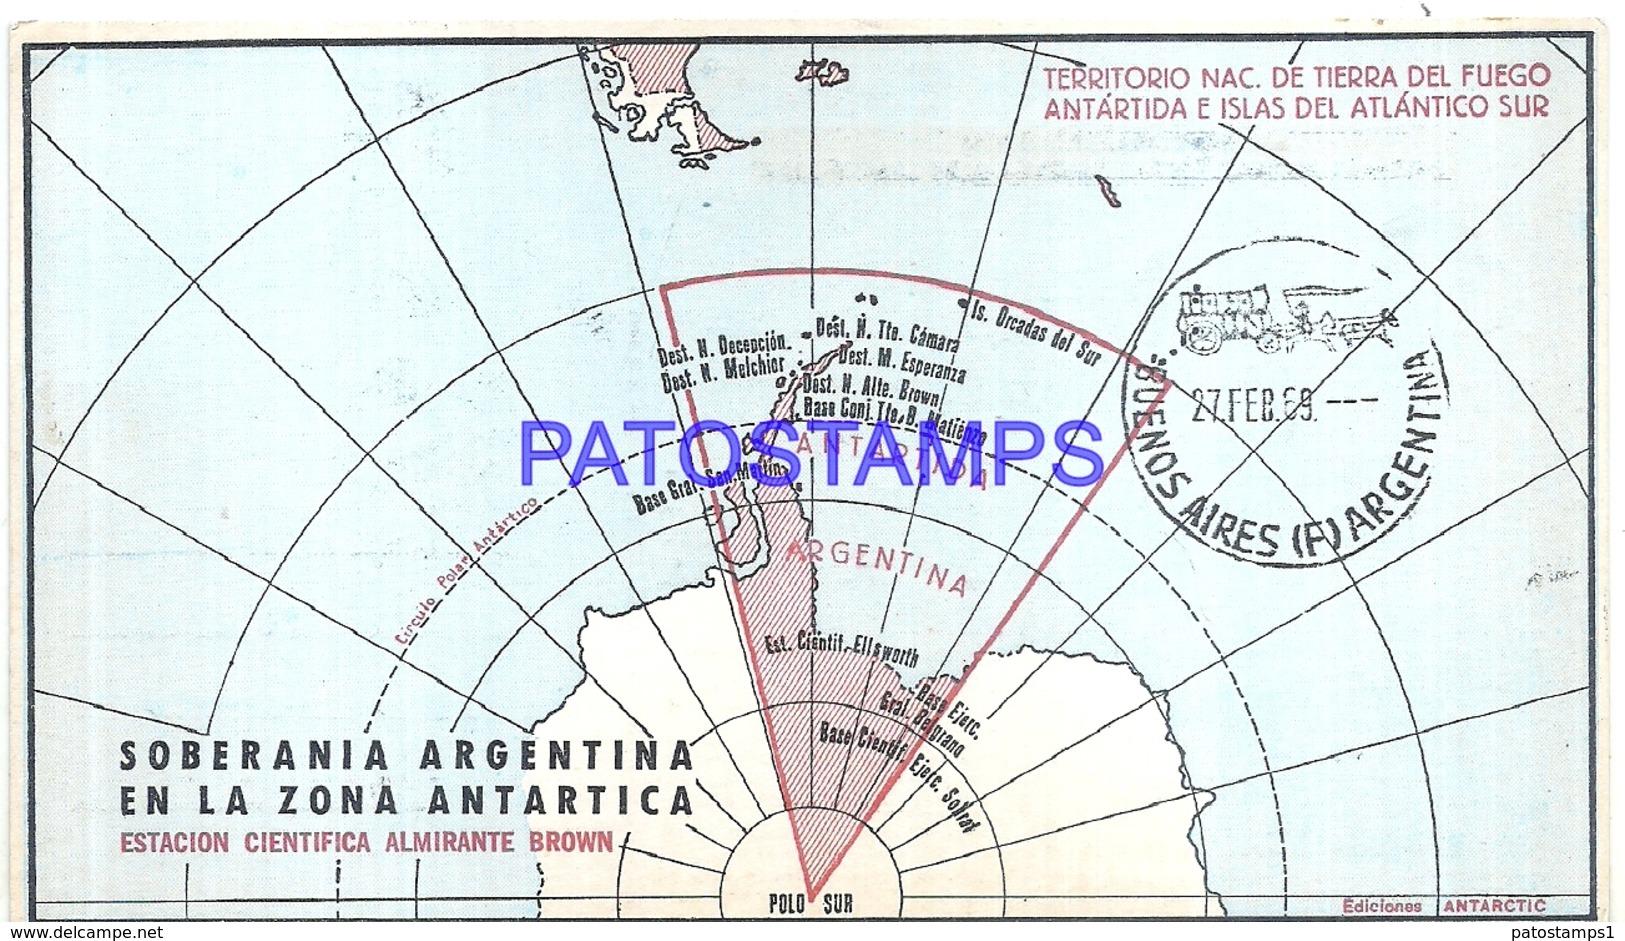 117445 ARGENTINA ANTARTIDA ANTARCTICA ESTACION CIENTIFICA ALMIRANTE BROWN MAP MAPA 1969 CIRCULATED TO BS AS NO POSTCARD - Argentina